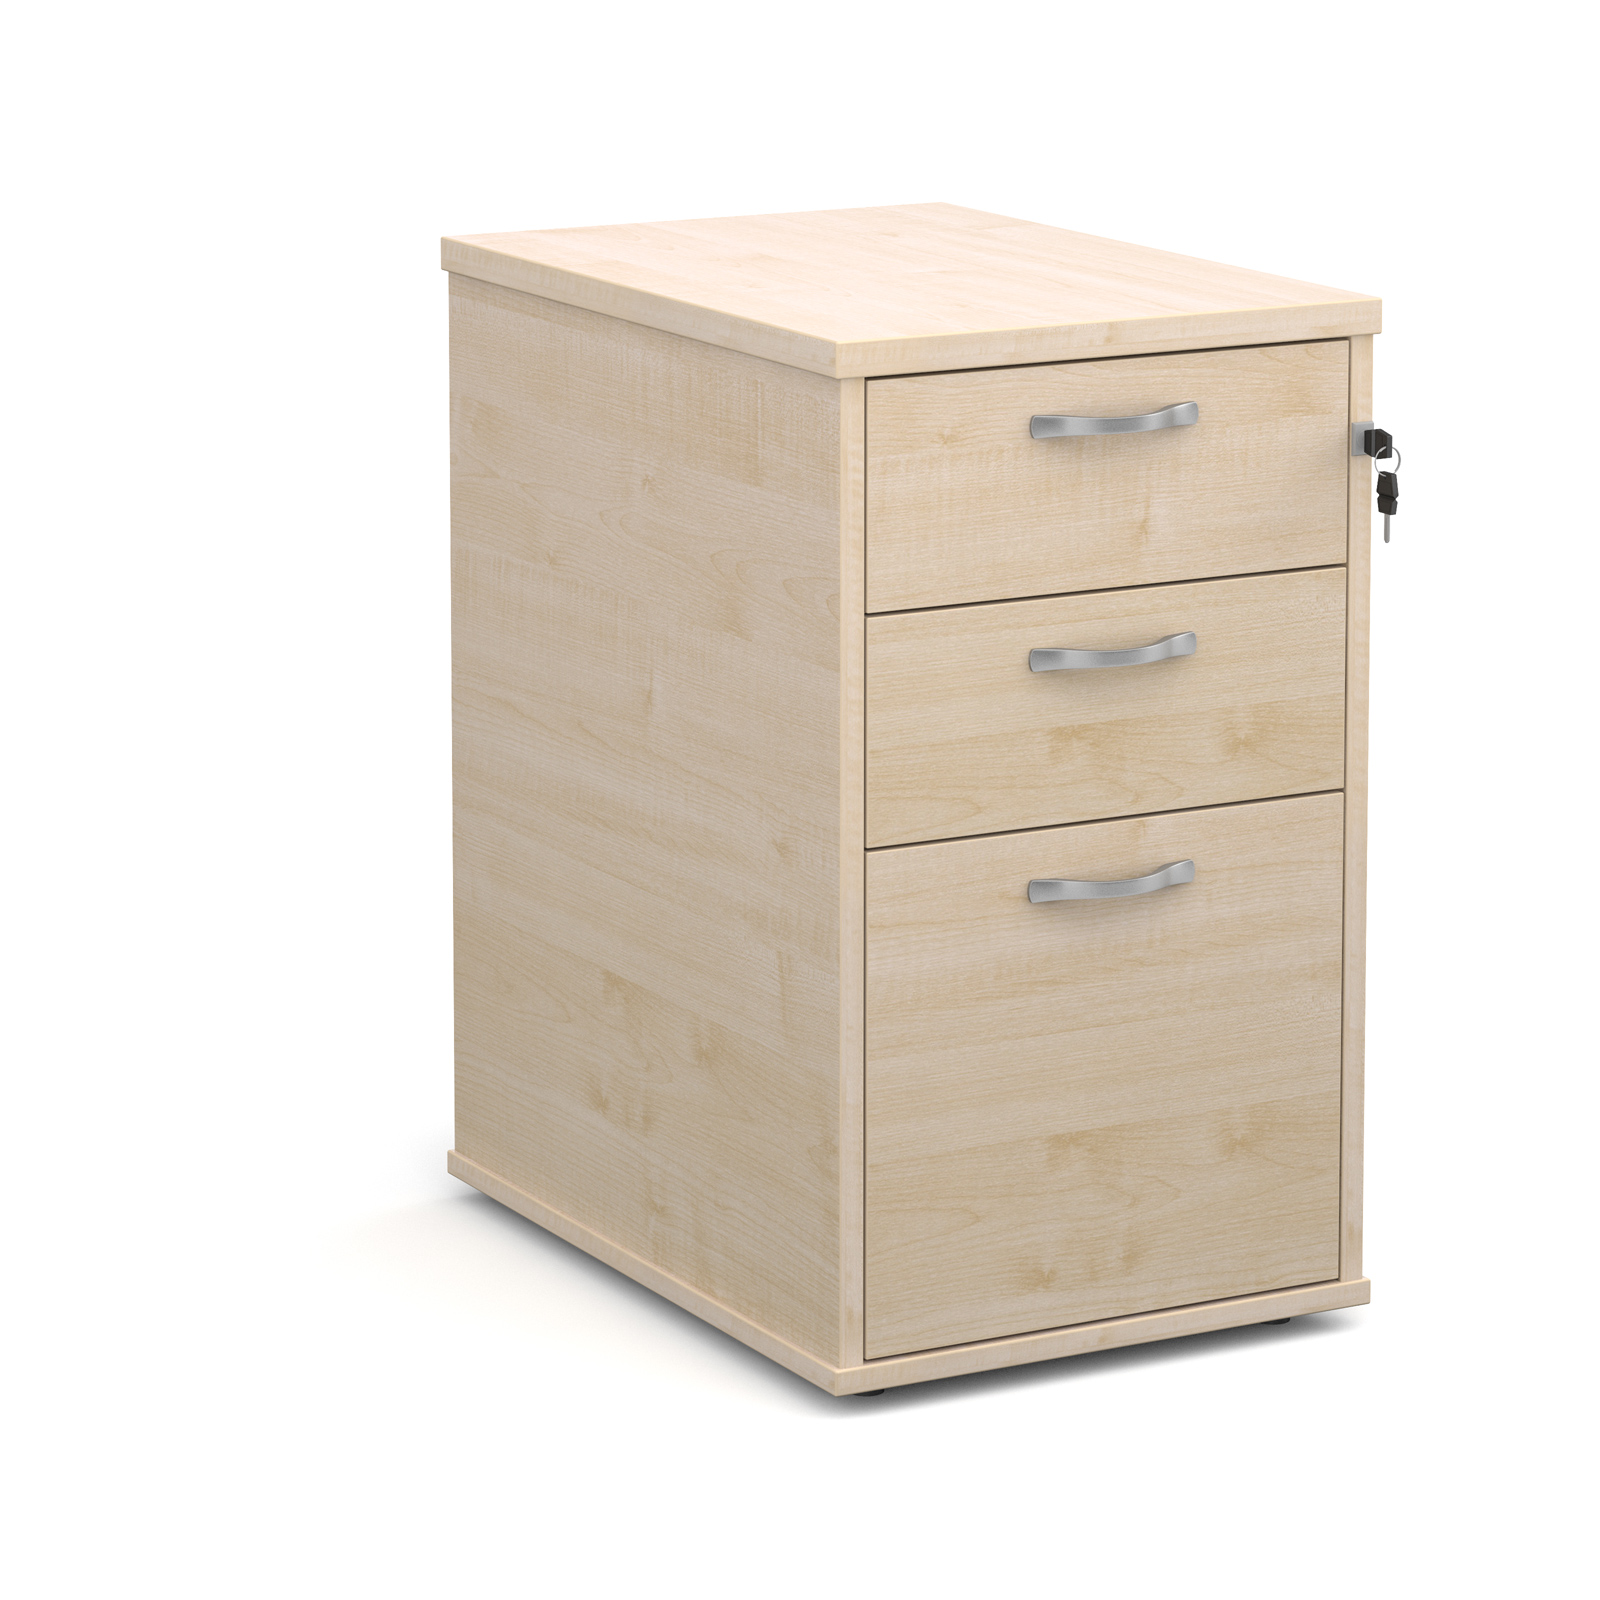 Image for Desk High Pedestal With Silver Handles (0)